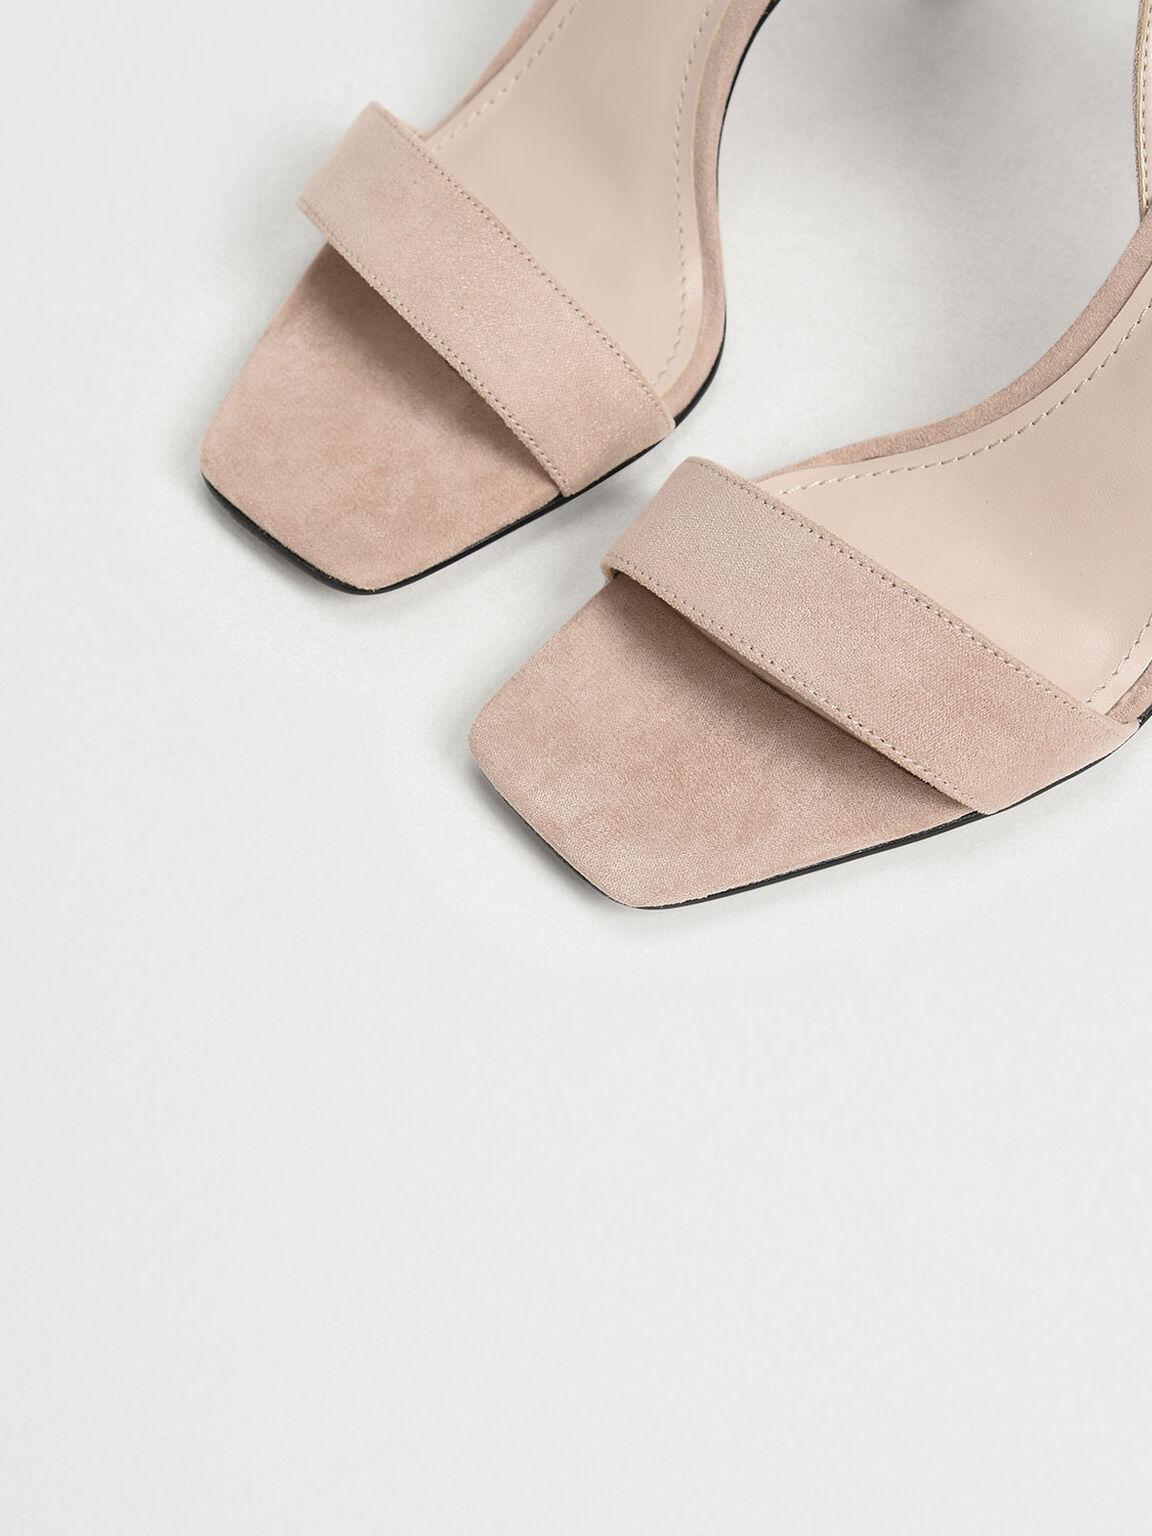 Open Toe Ankle Strap Stiletto Sandals, Nude, hi-res